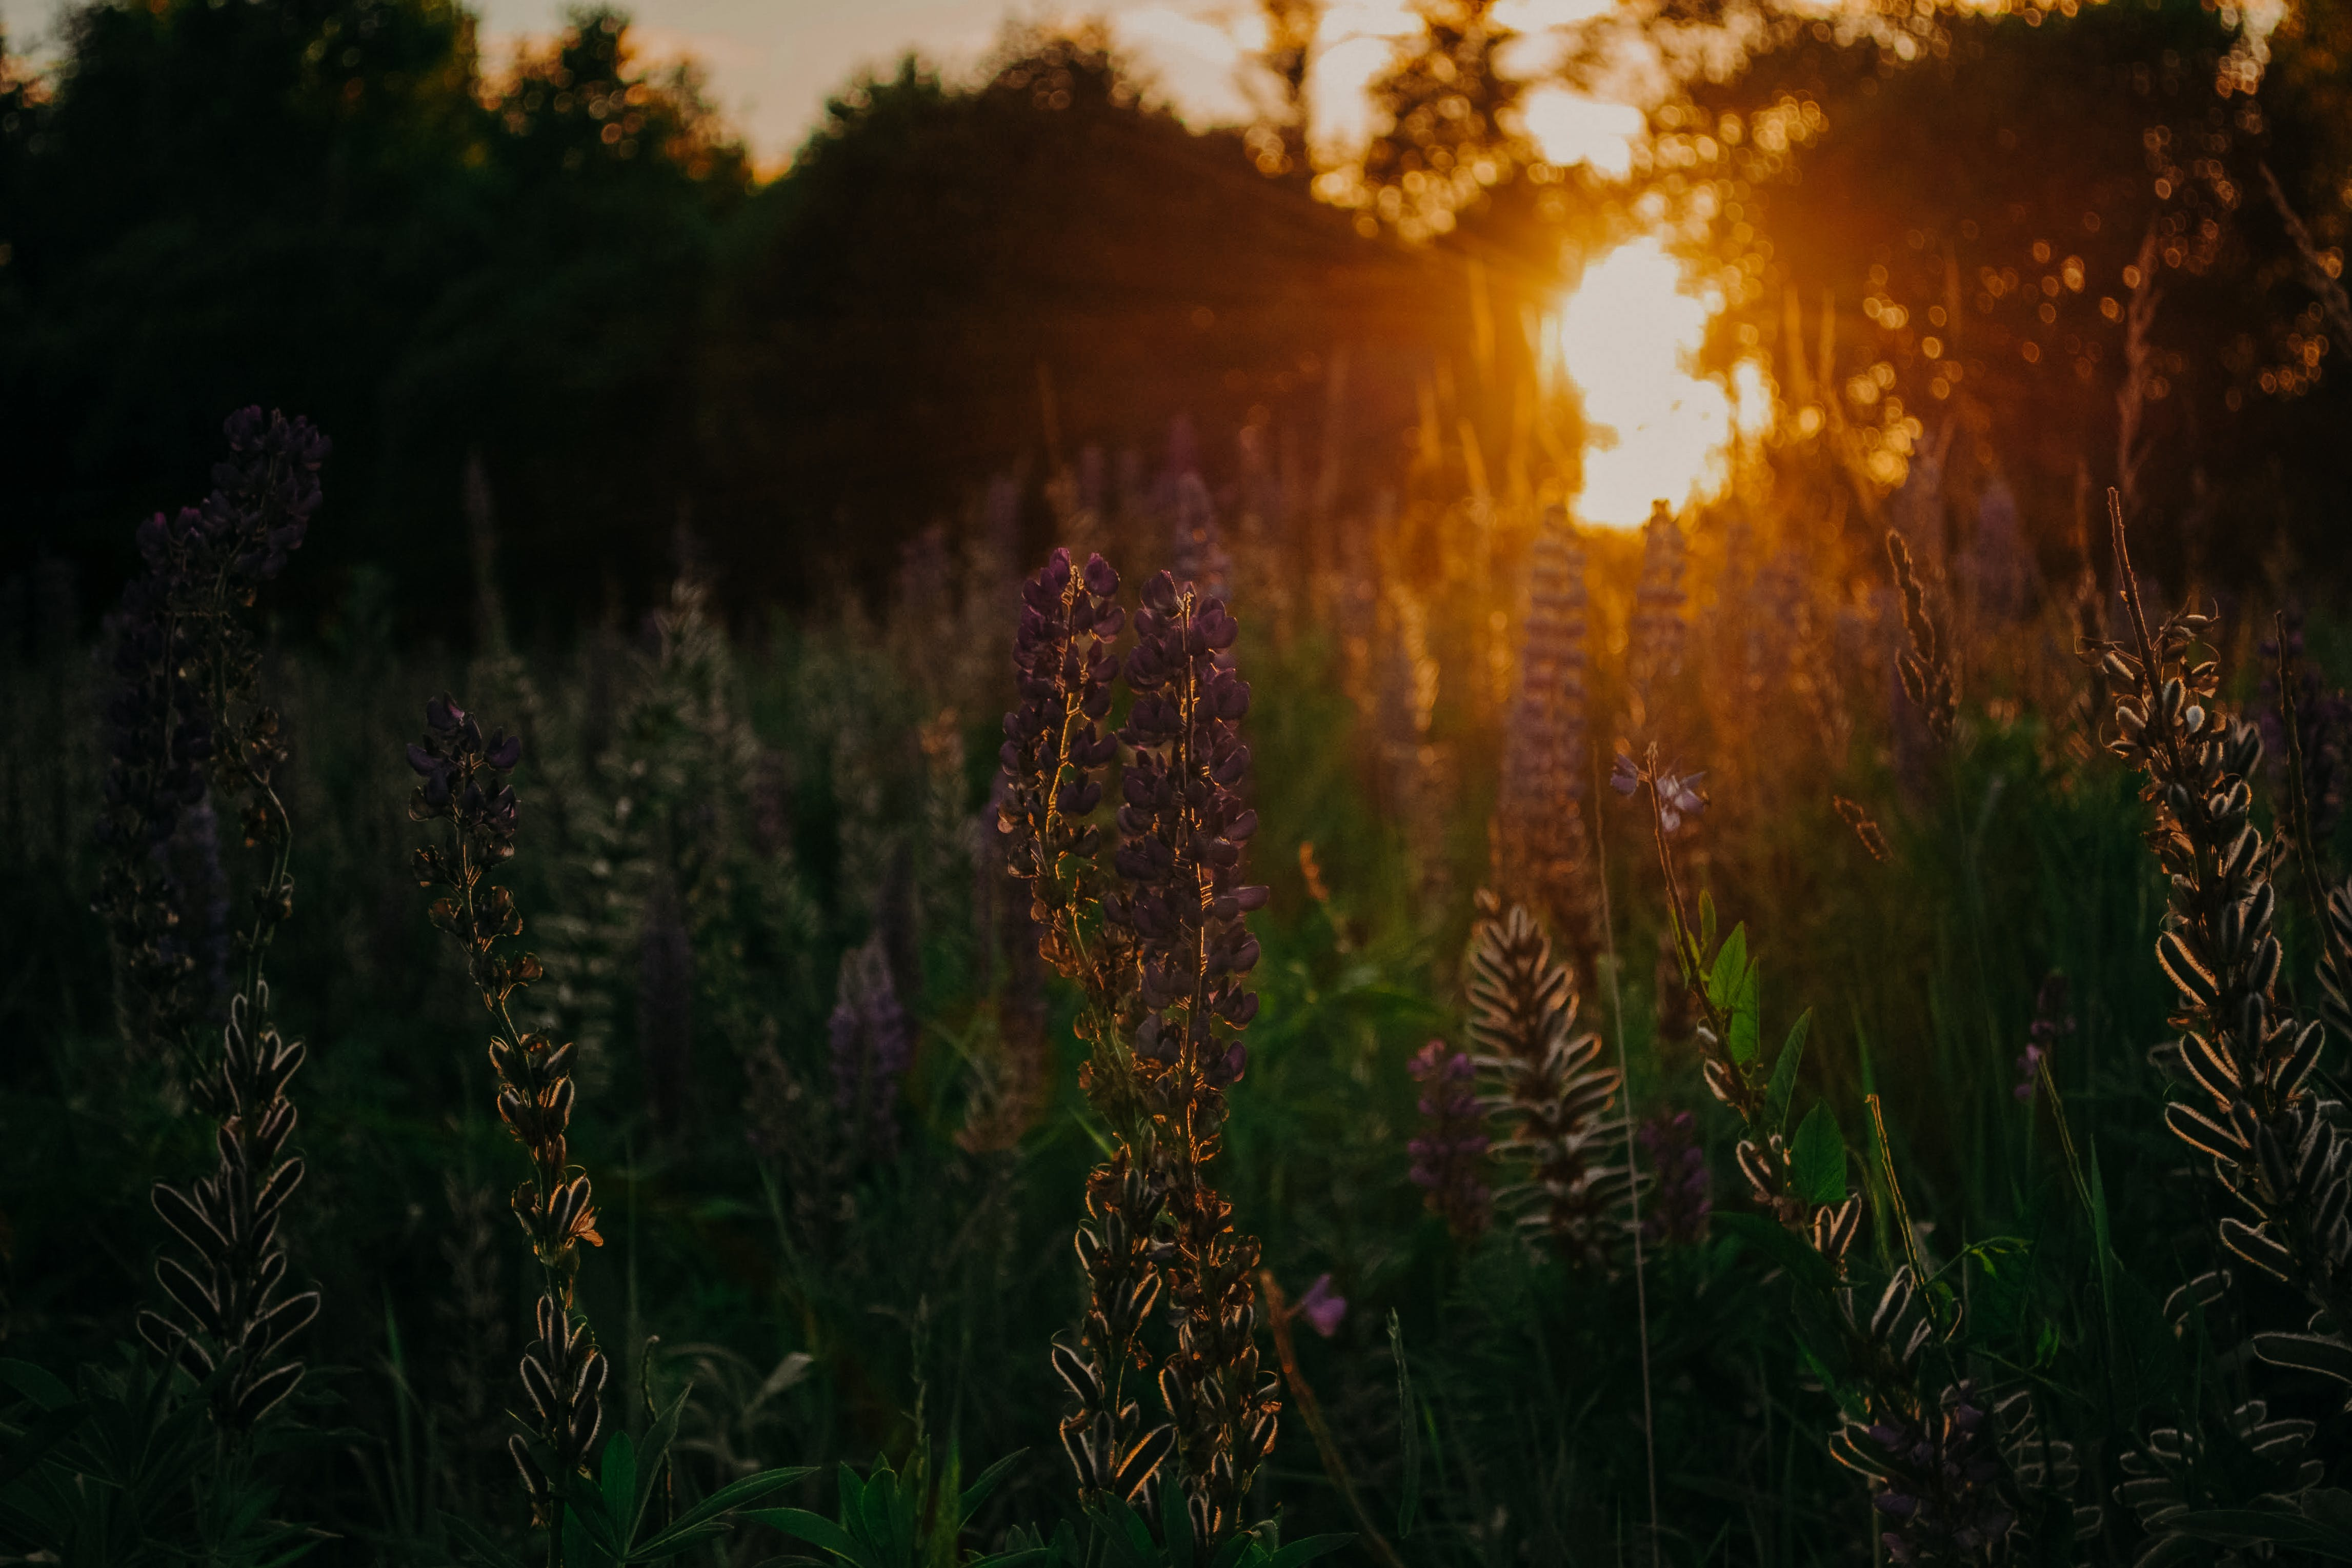 Kostenloses Stock Foto zu bäume, blumen, blüte, dunkelgrün